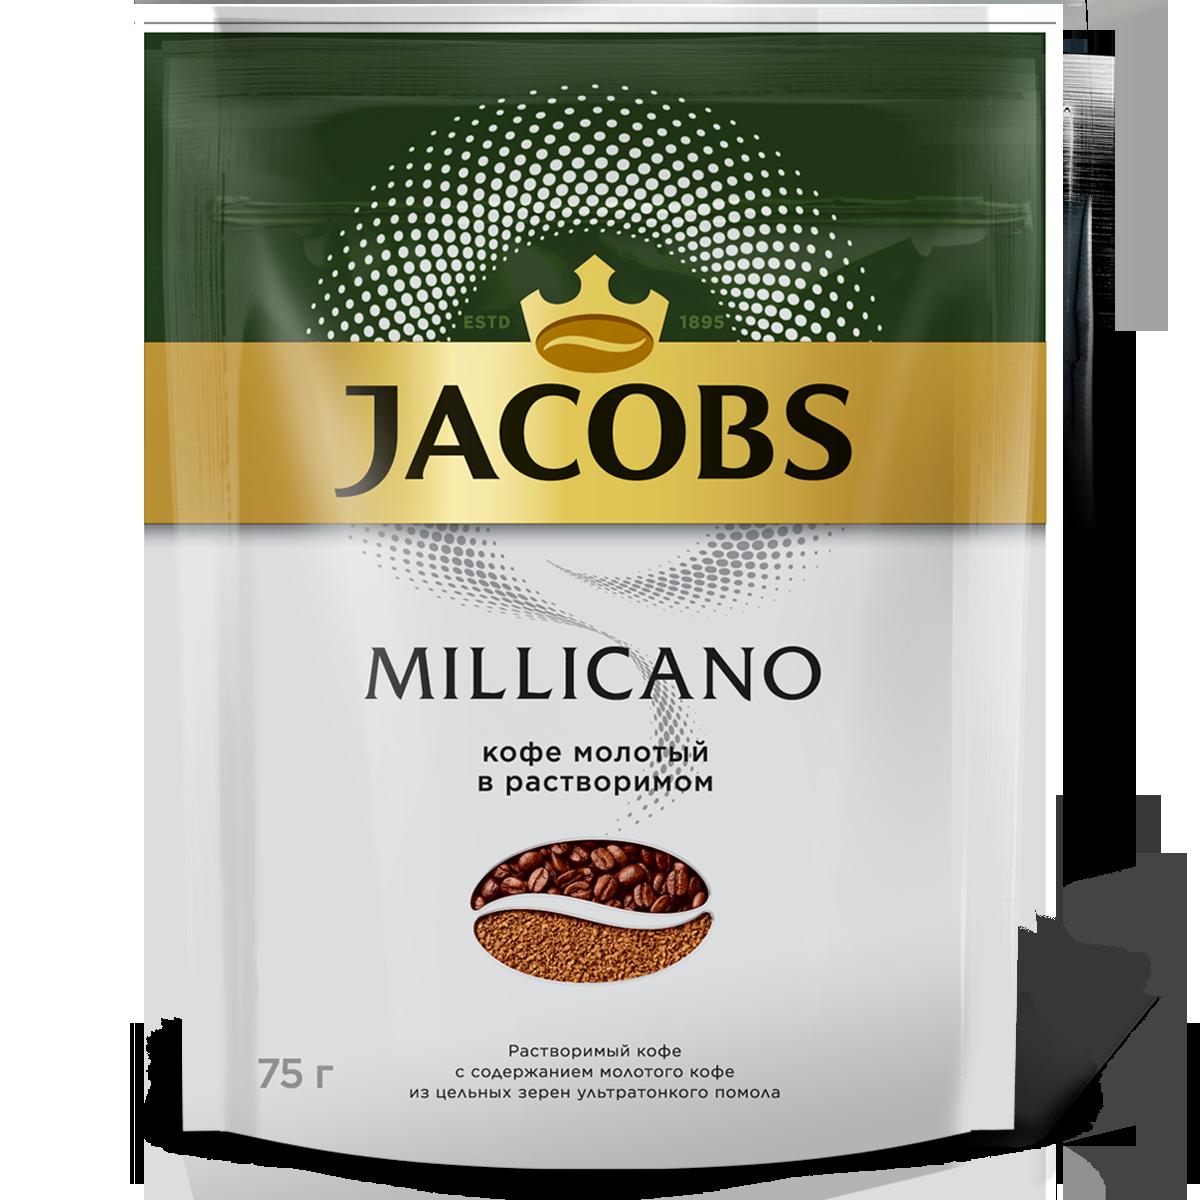 Кофе растворимый Jacobs monarch millicano 75 г